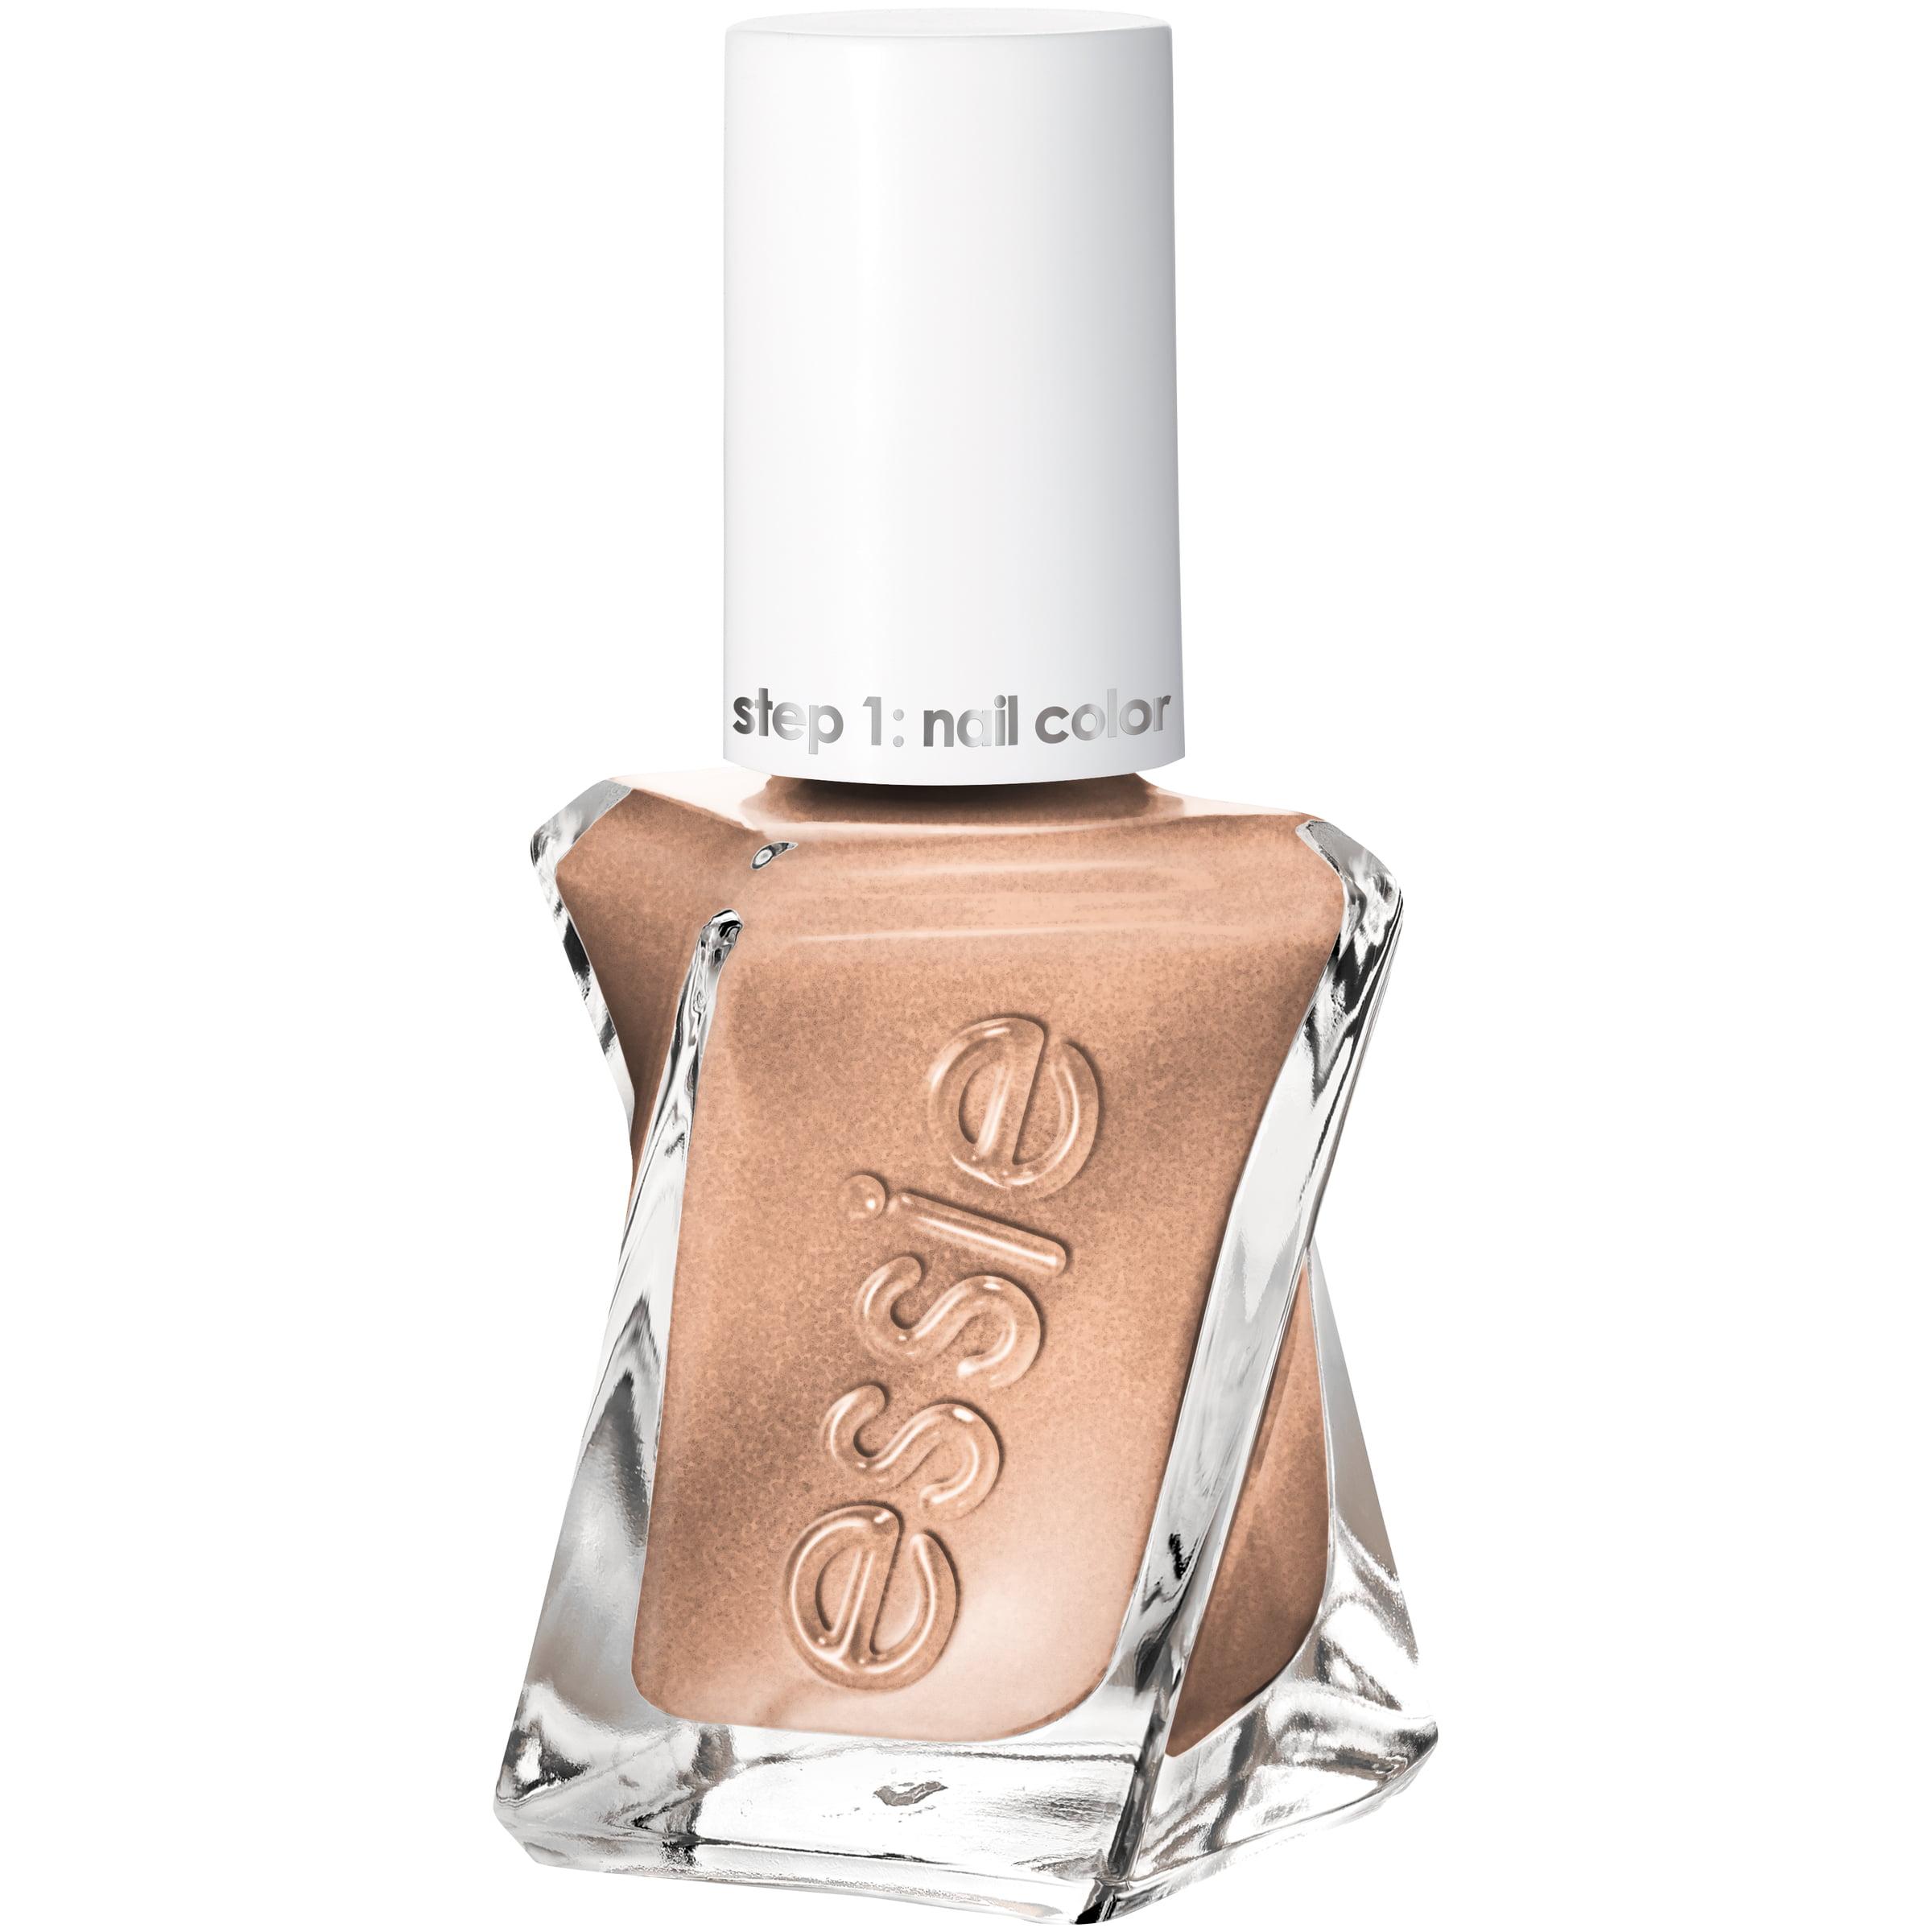 essie Gel Couture Nail Polish (Metallics), Daring Damsel, 0.46 fl oz